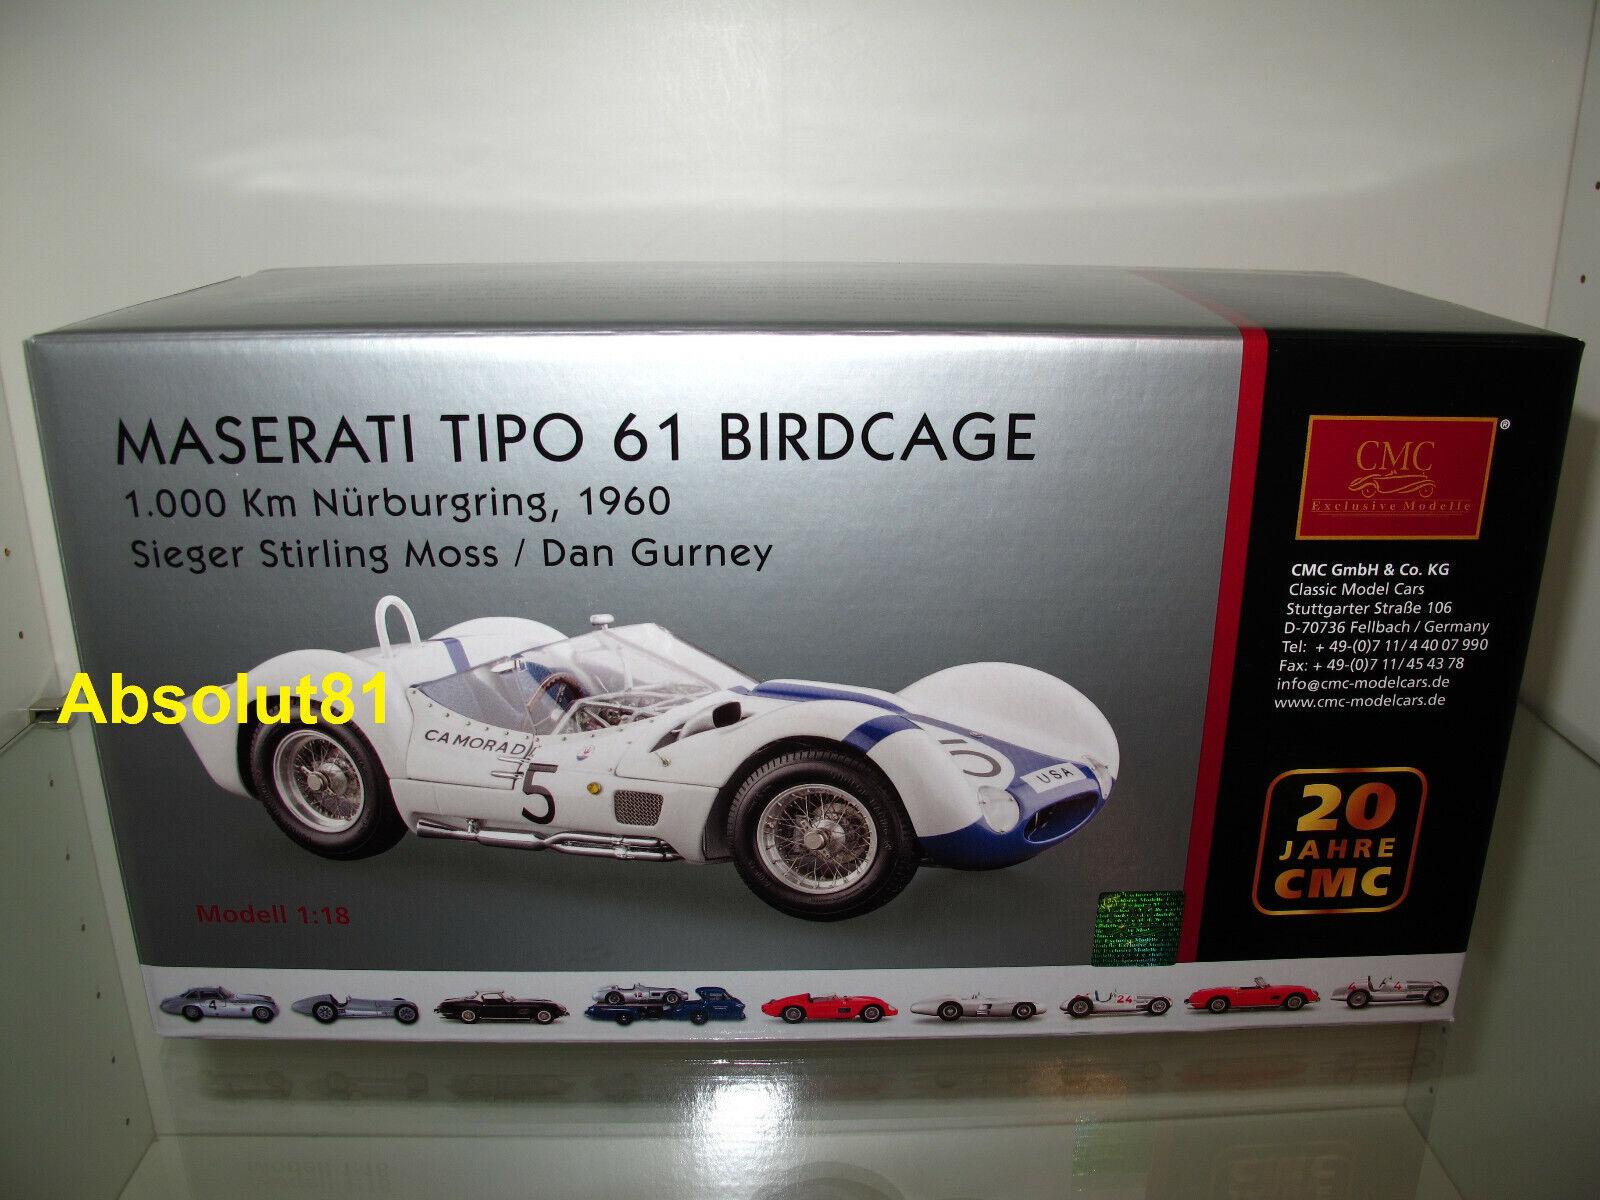 1:18 CMC m-047 MASERATI TIPO 61 Birdcage Nurburgring 60 Stirling Moss Dan Gurney